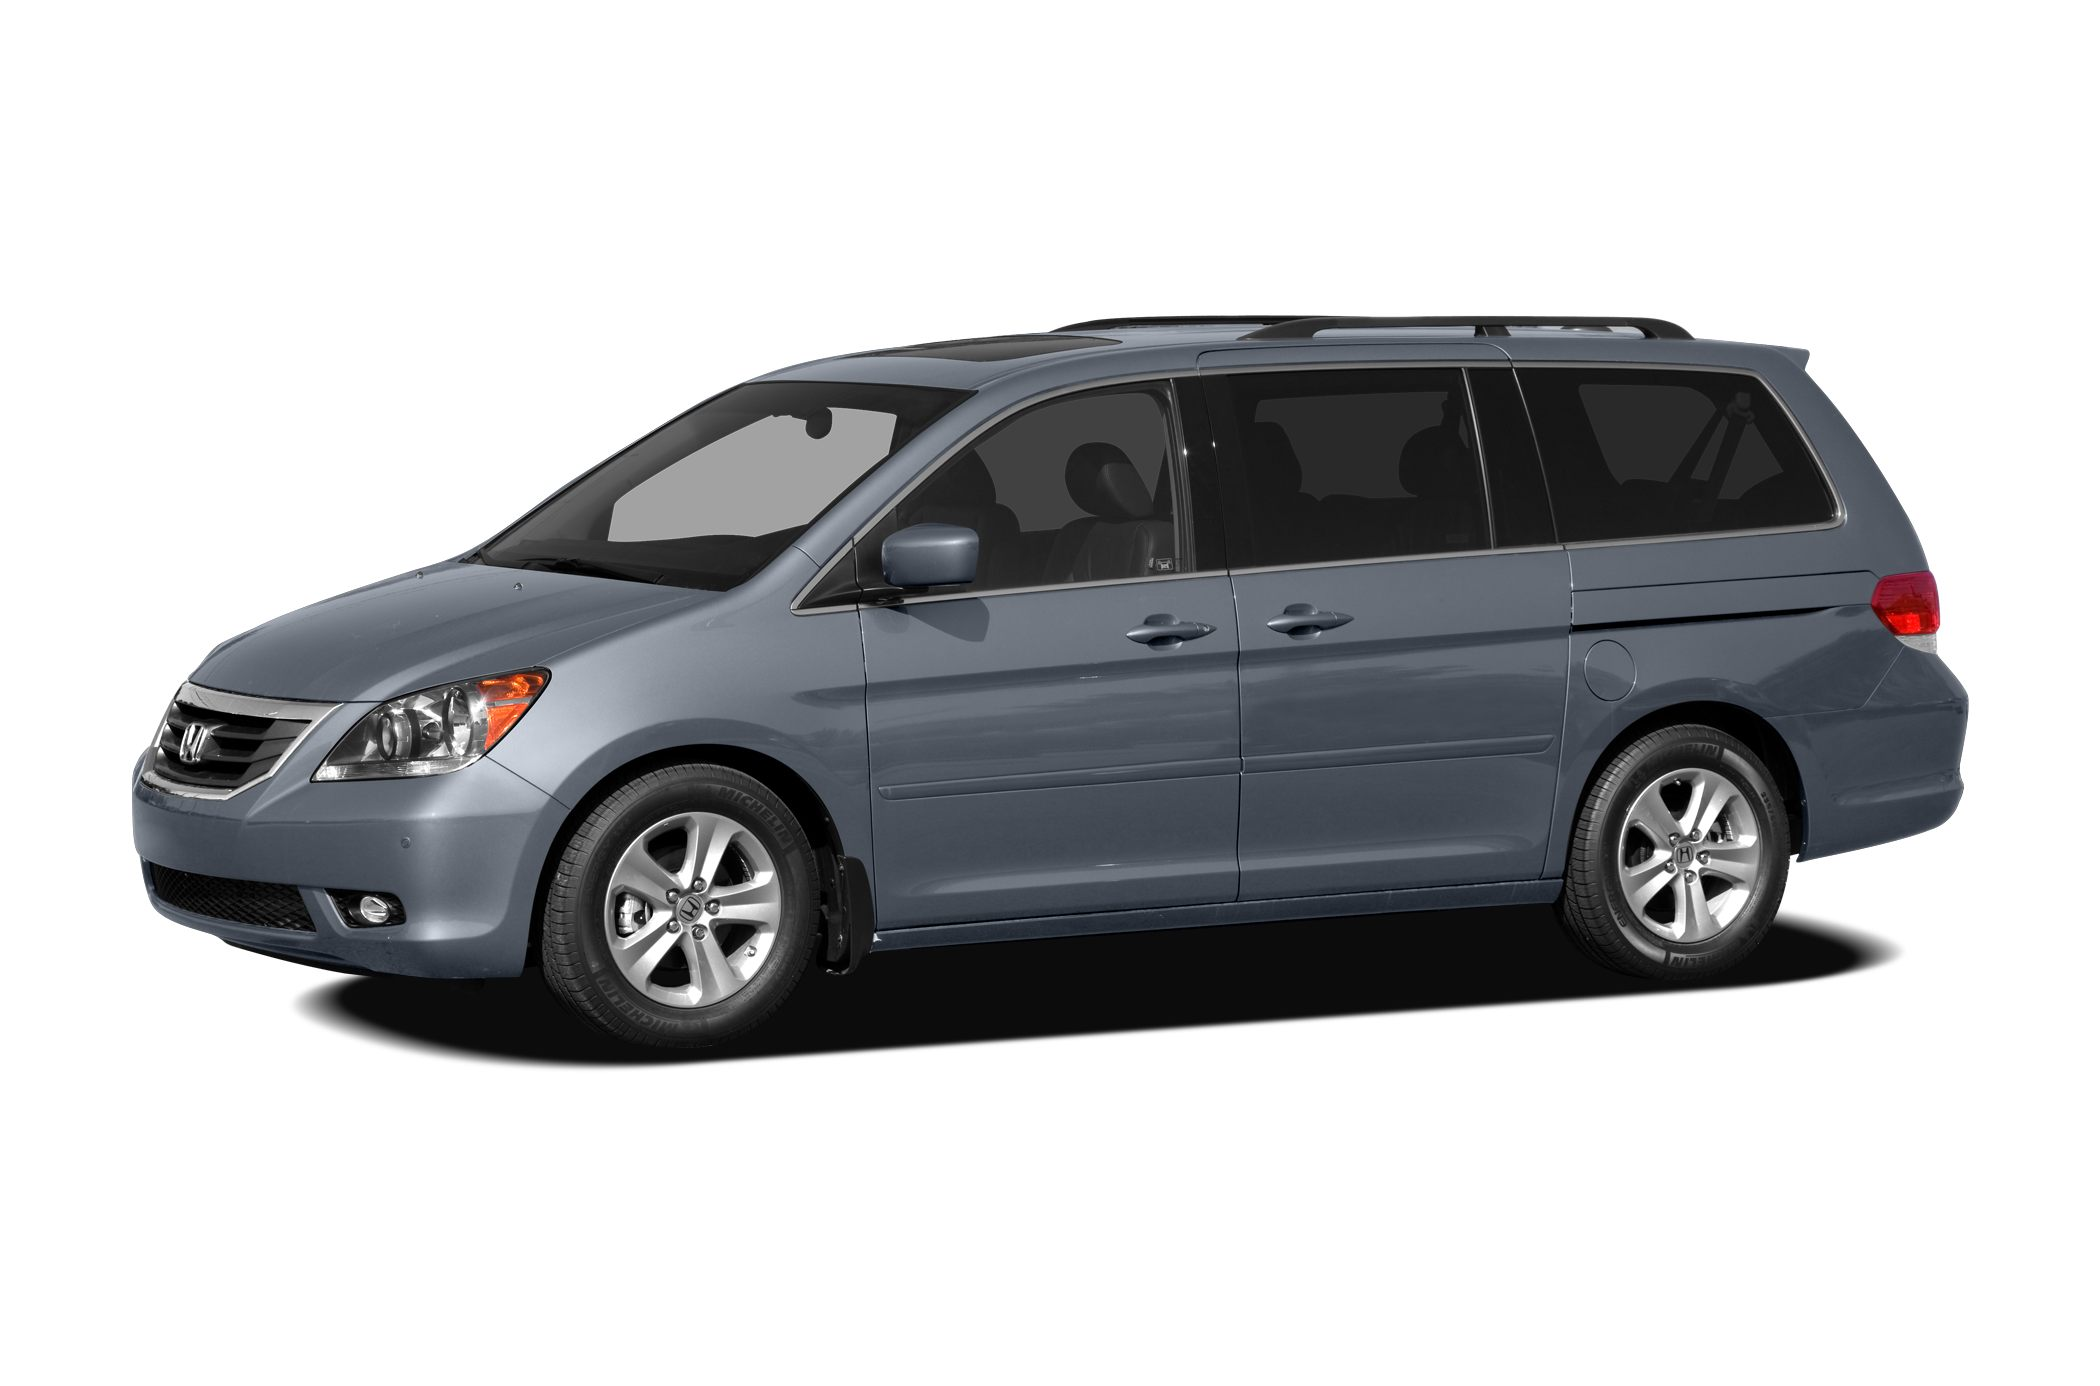 2009 Honda Odyssey Touring w RES Navigation 10 MINUTE CREDIT CHECK BAD CREDIT NO CREDIT NO PR